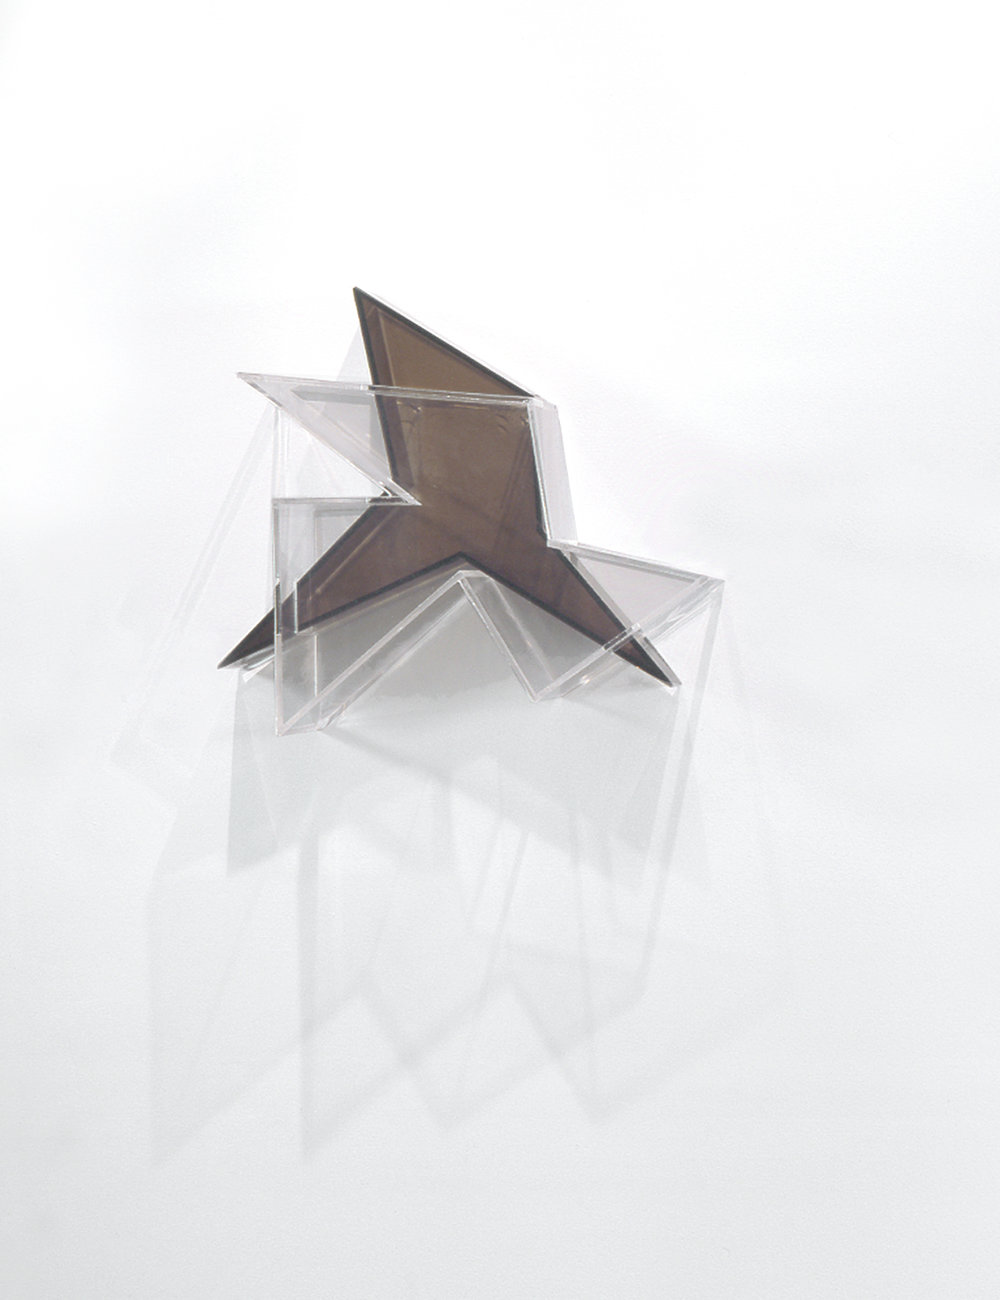 Settled Edge  (grey) 2004 Plexiglas 19Hx18Wx4.5D inches / 48x46x11 cm